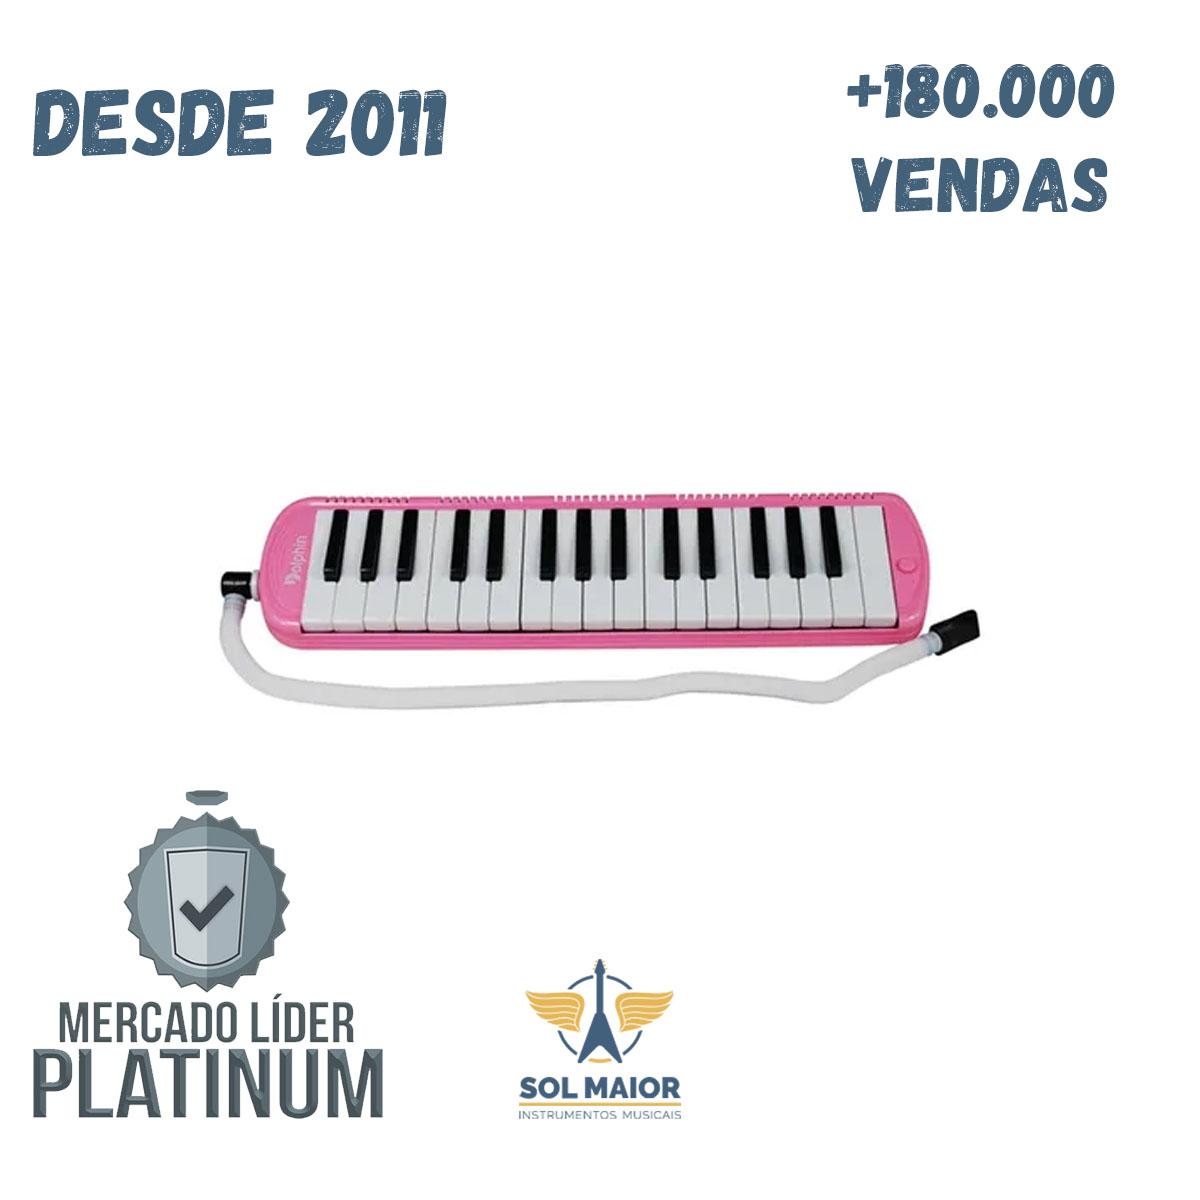 Escaleta 32 Teclas C/Case Pink DOLPHIN 9698